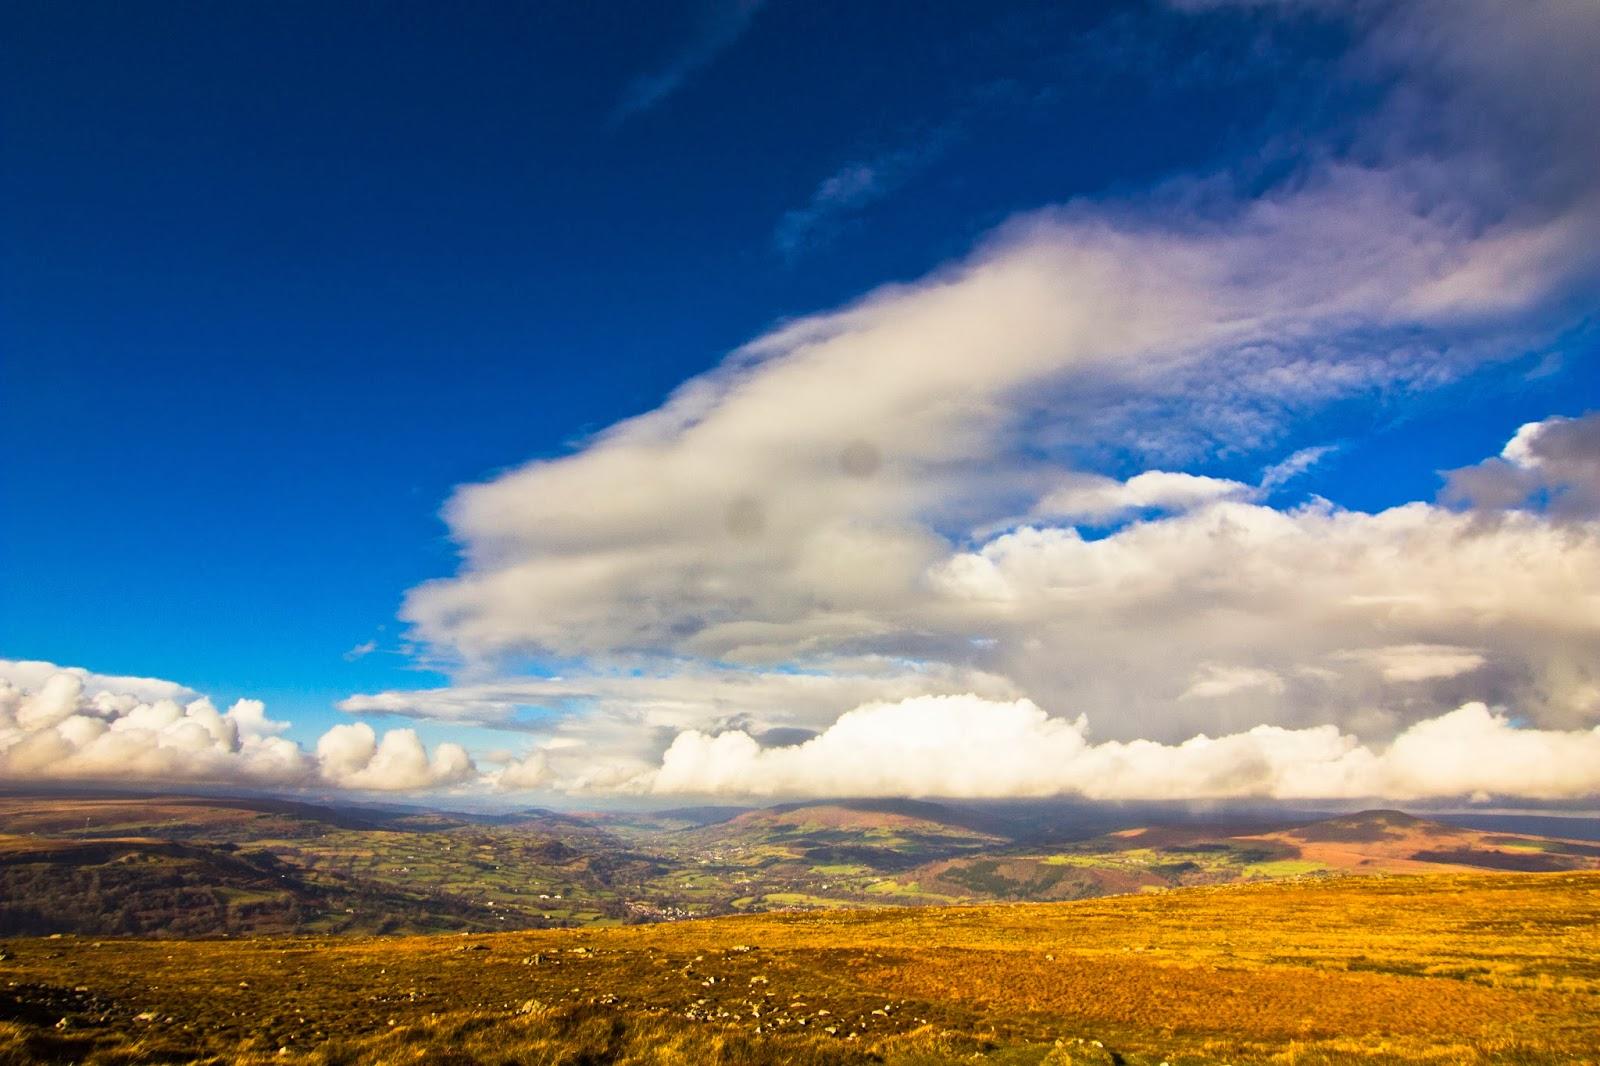 Blorenge, Black Mountains, Brecon Beacons National Park